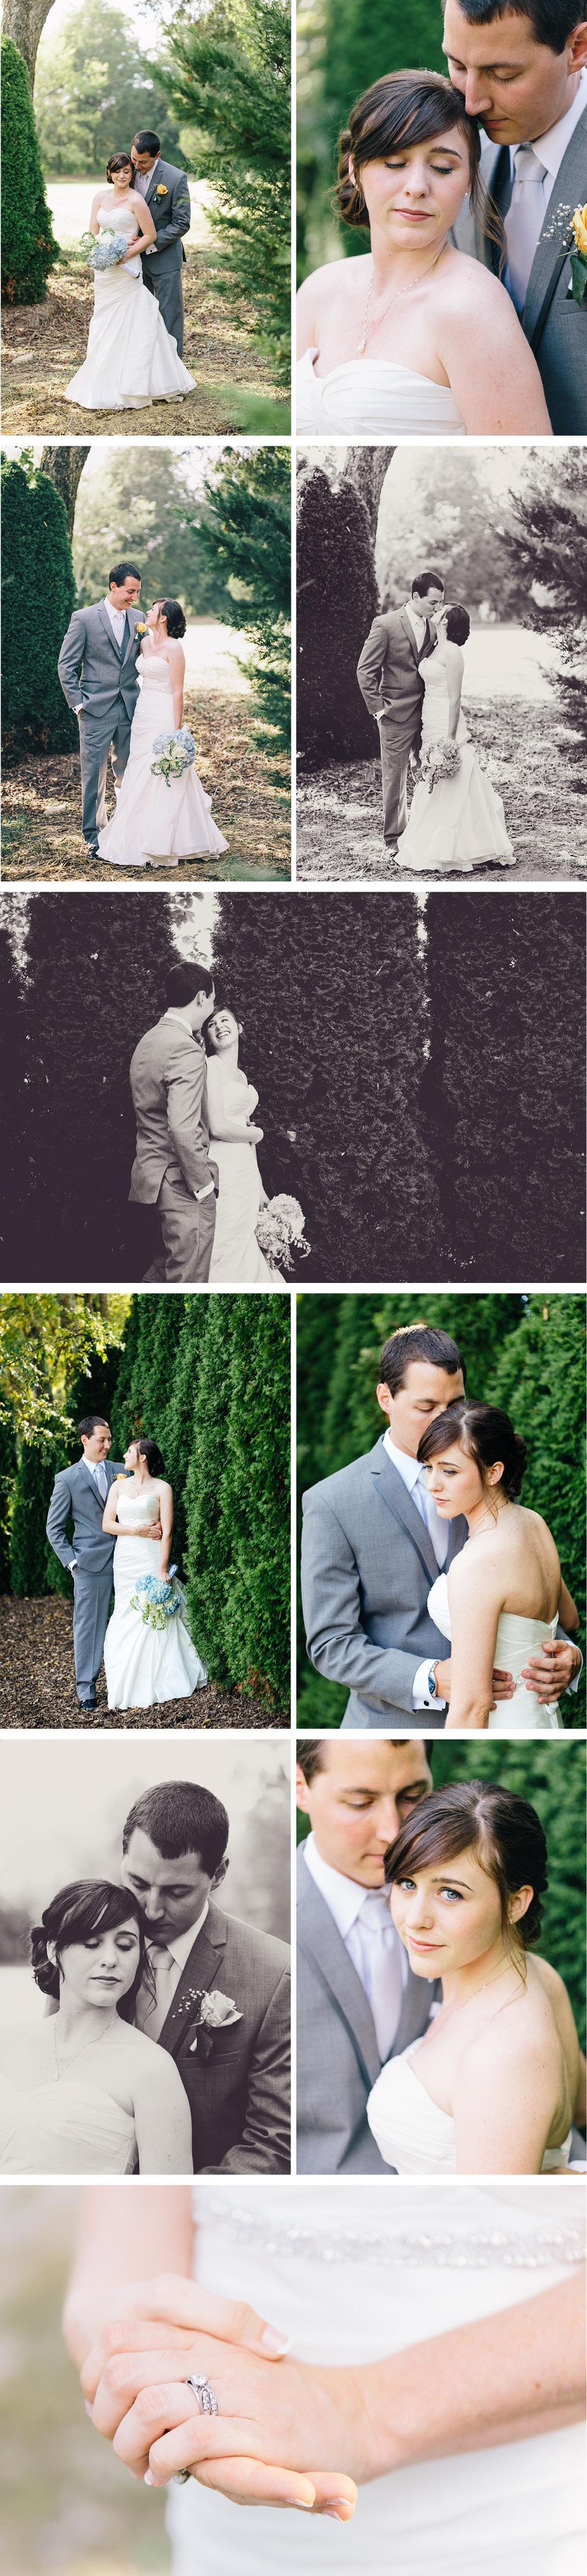 CK-Photo-Nashville-Wedding-Photographer-Brown3.jpg